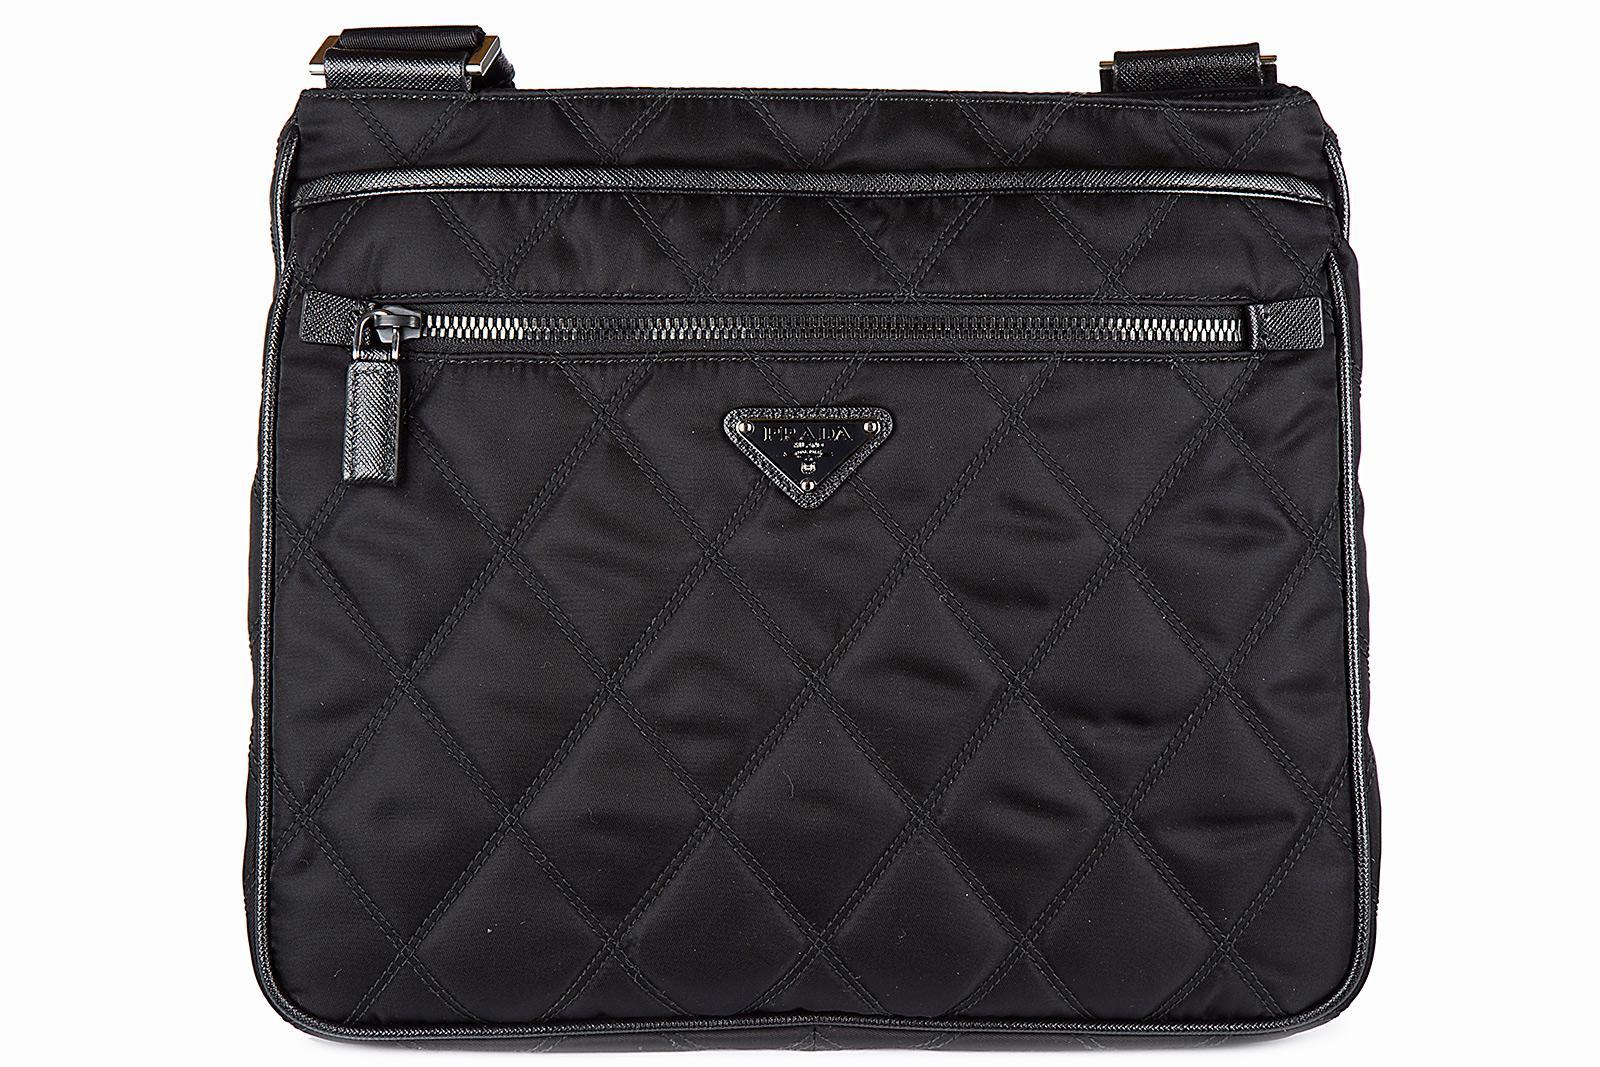 Satchel Bags - Cartella Satchel Bag Nylon Nero/Loto - black - Satchel Bags for ladies Prada XNyrqO